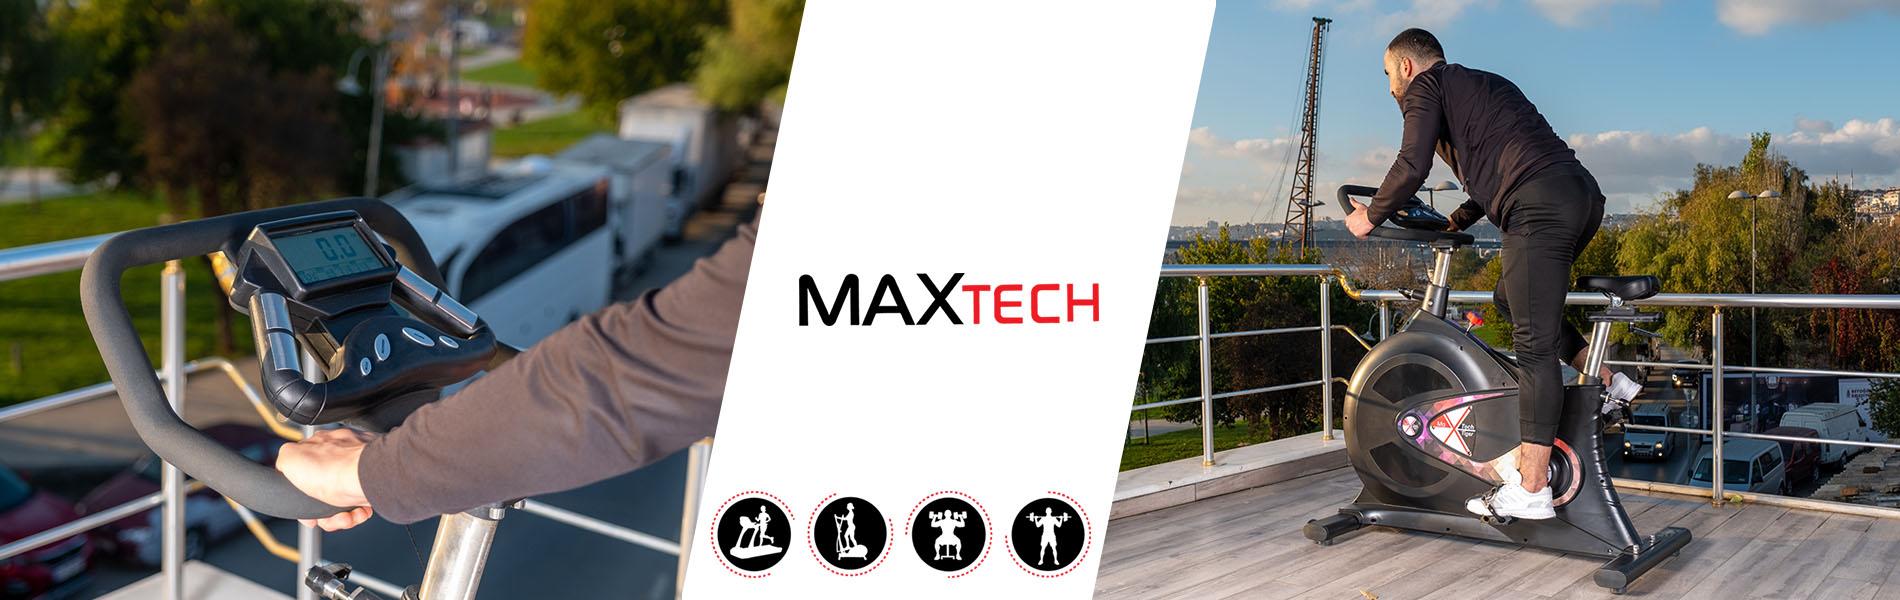 maxtech-fitness-ekipmanlari-sl-2021-3